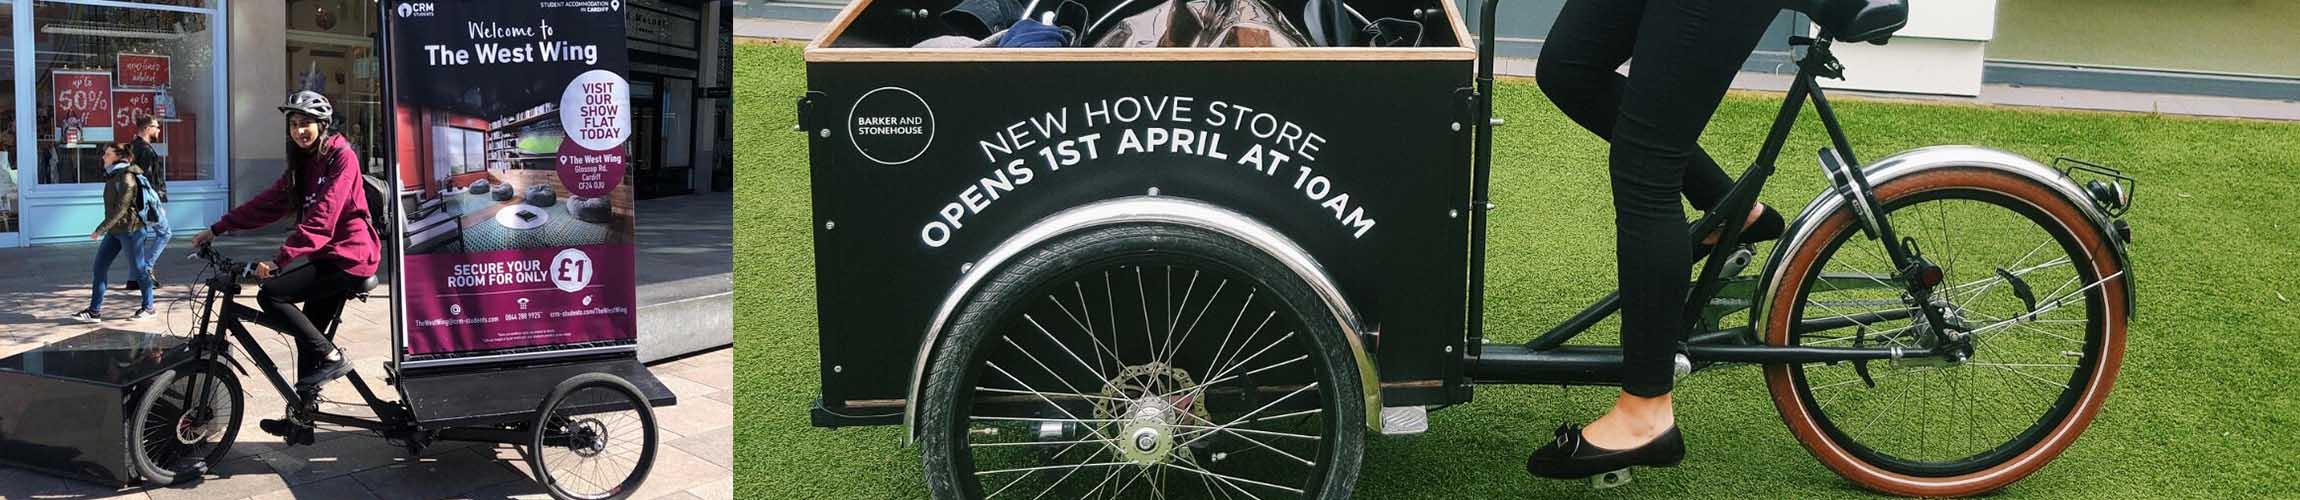 Media-Bikes-from-Varii-Promotions-the-Leading-UK-Media-Bikes-Agency-2020-header